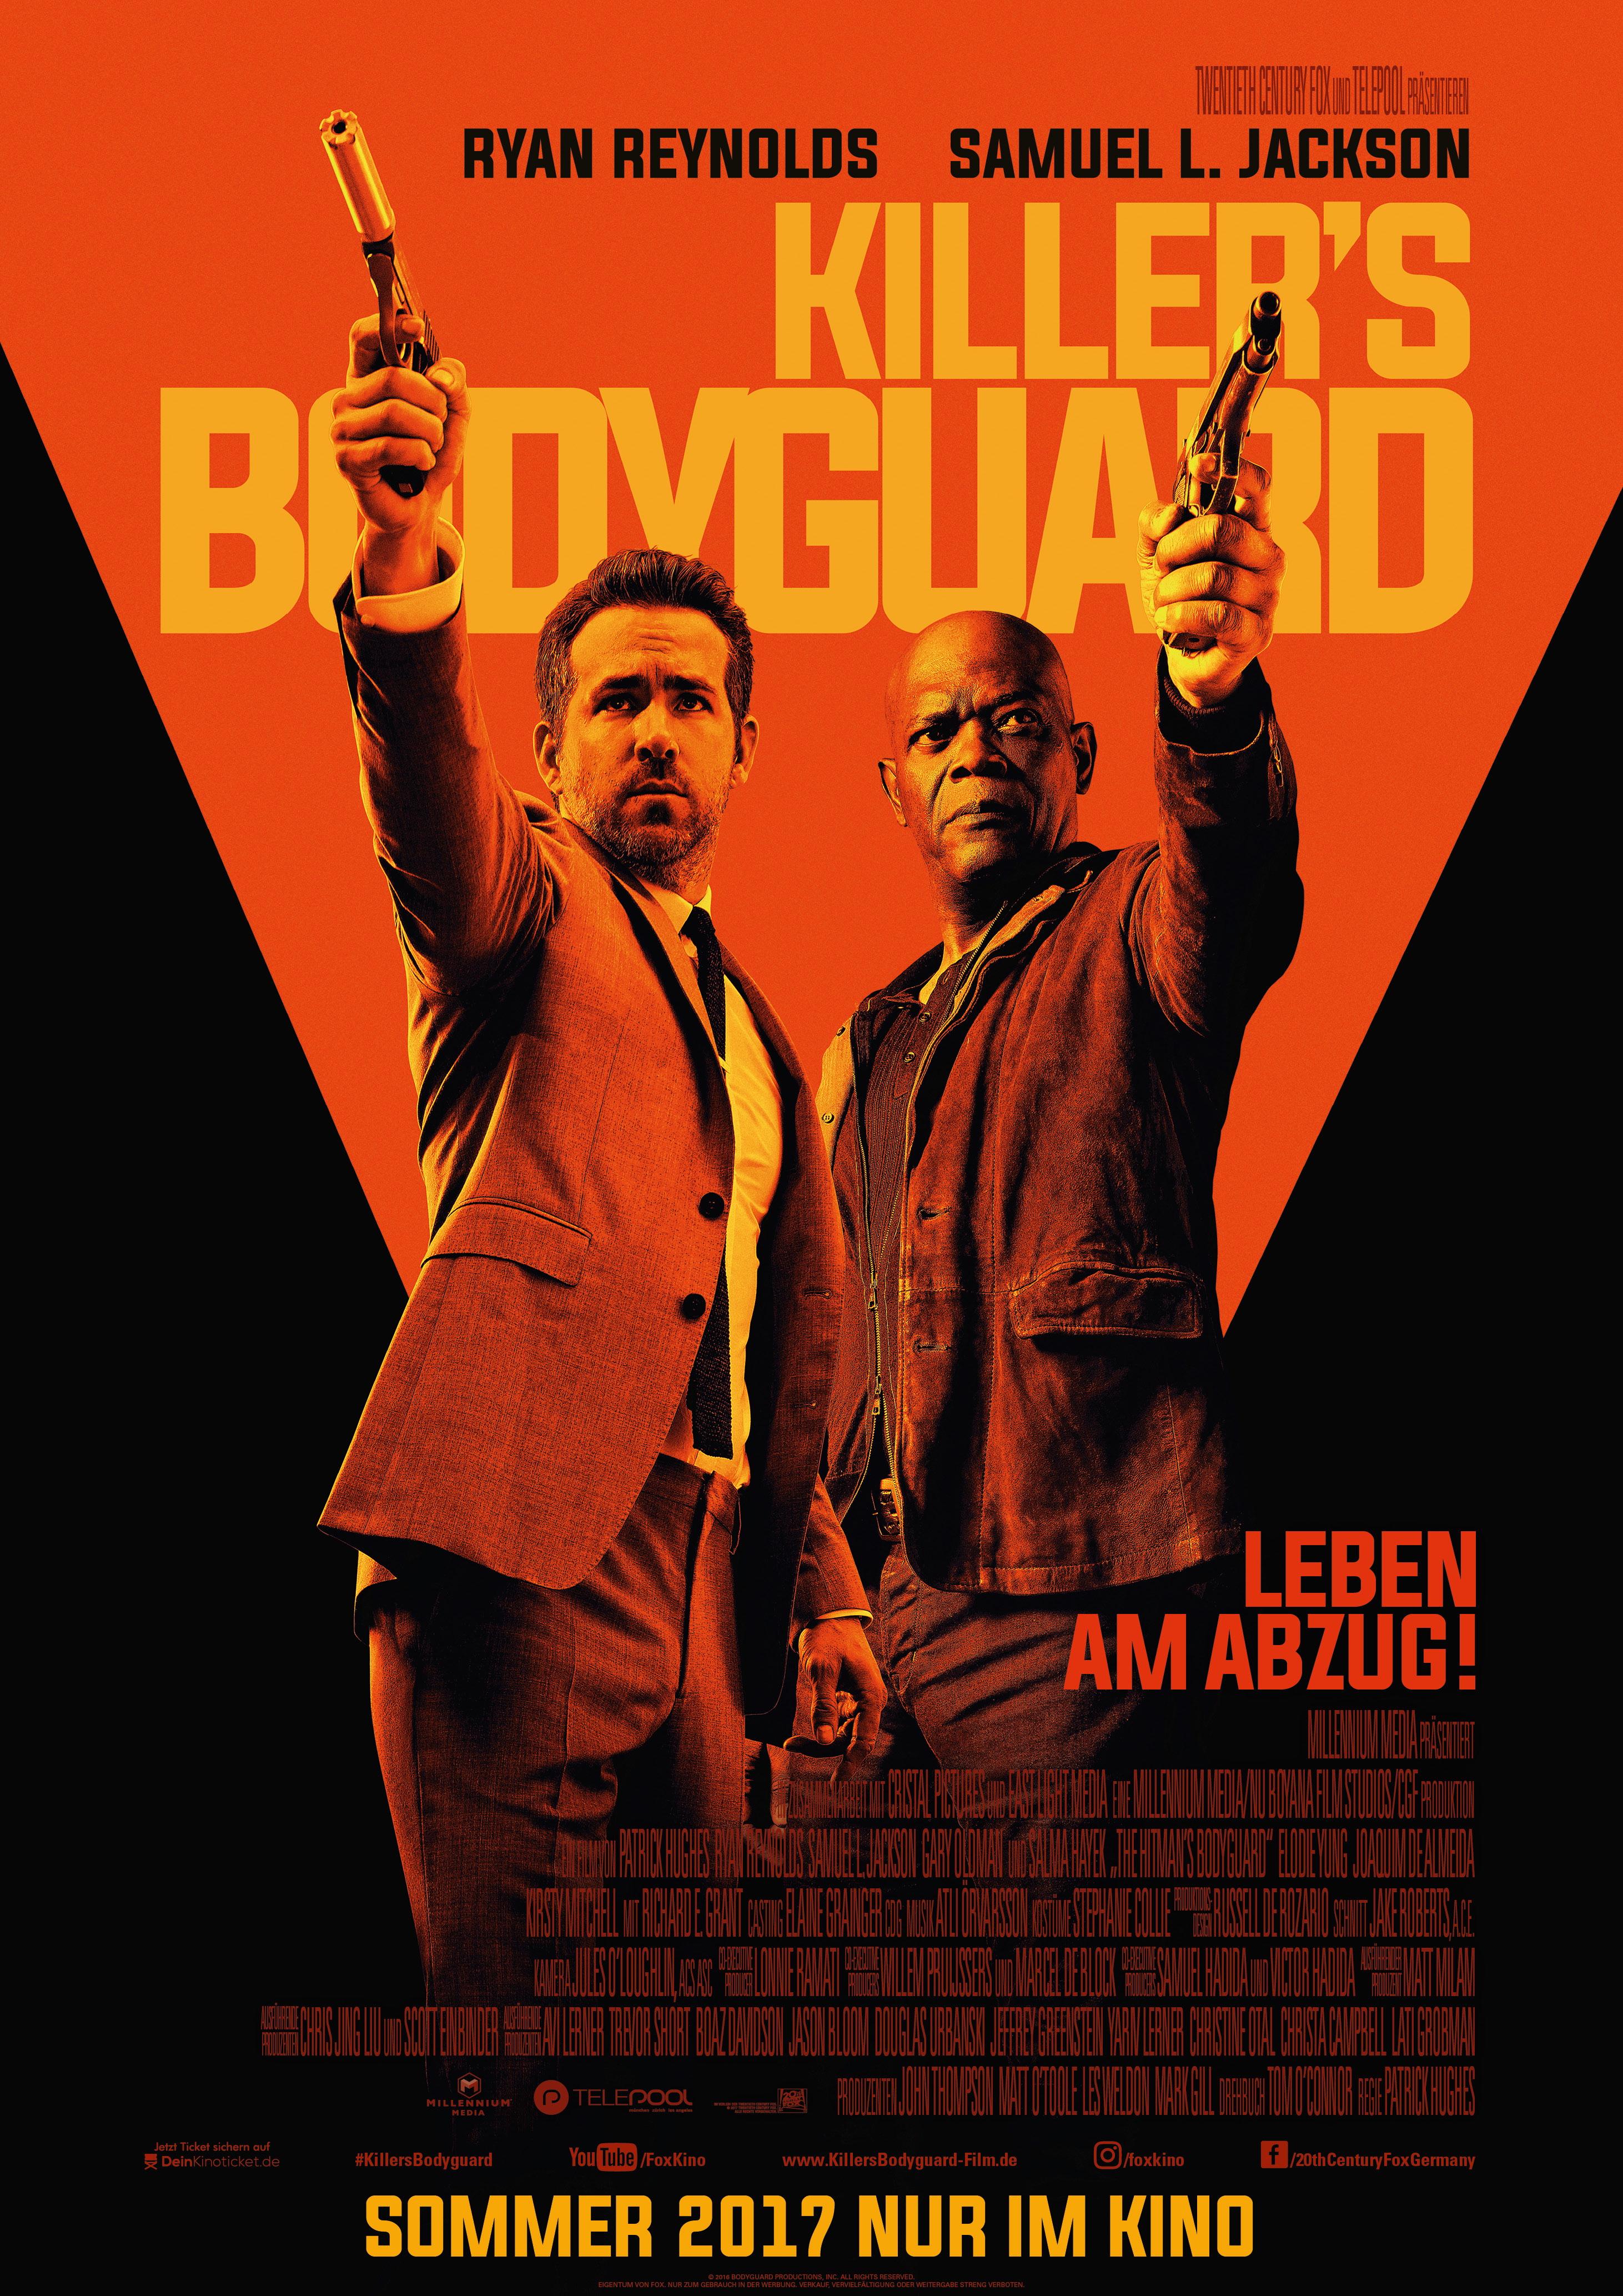 Killer's Bodyguard